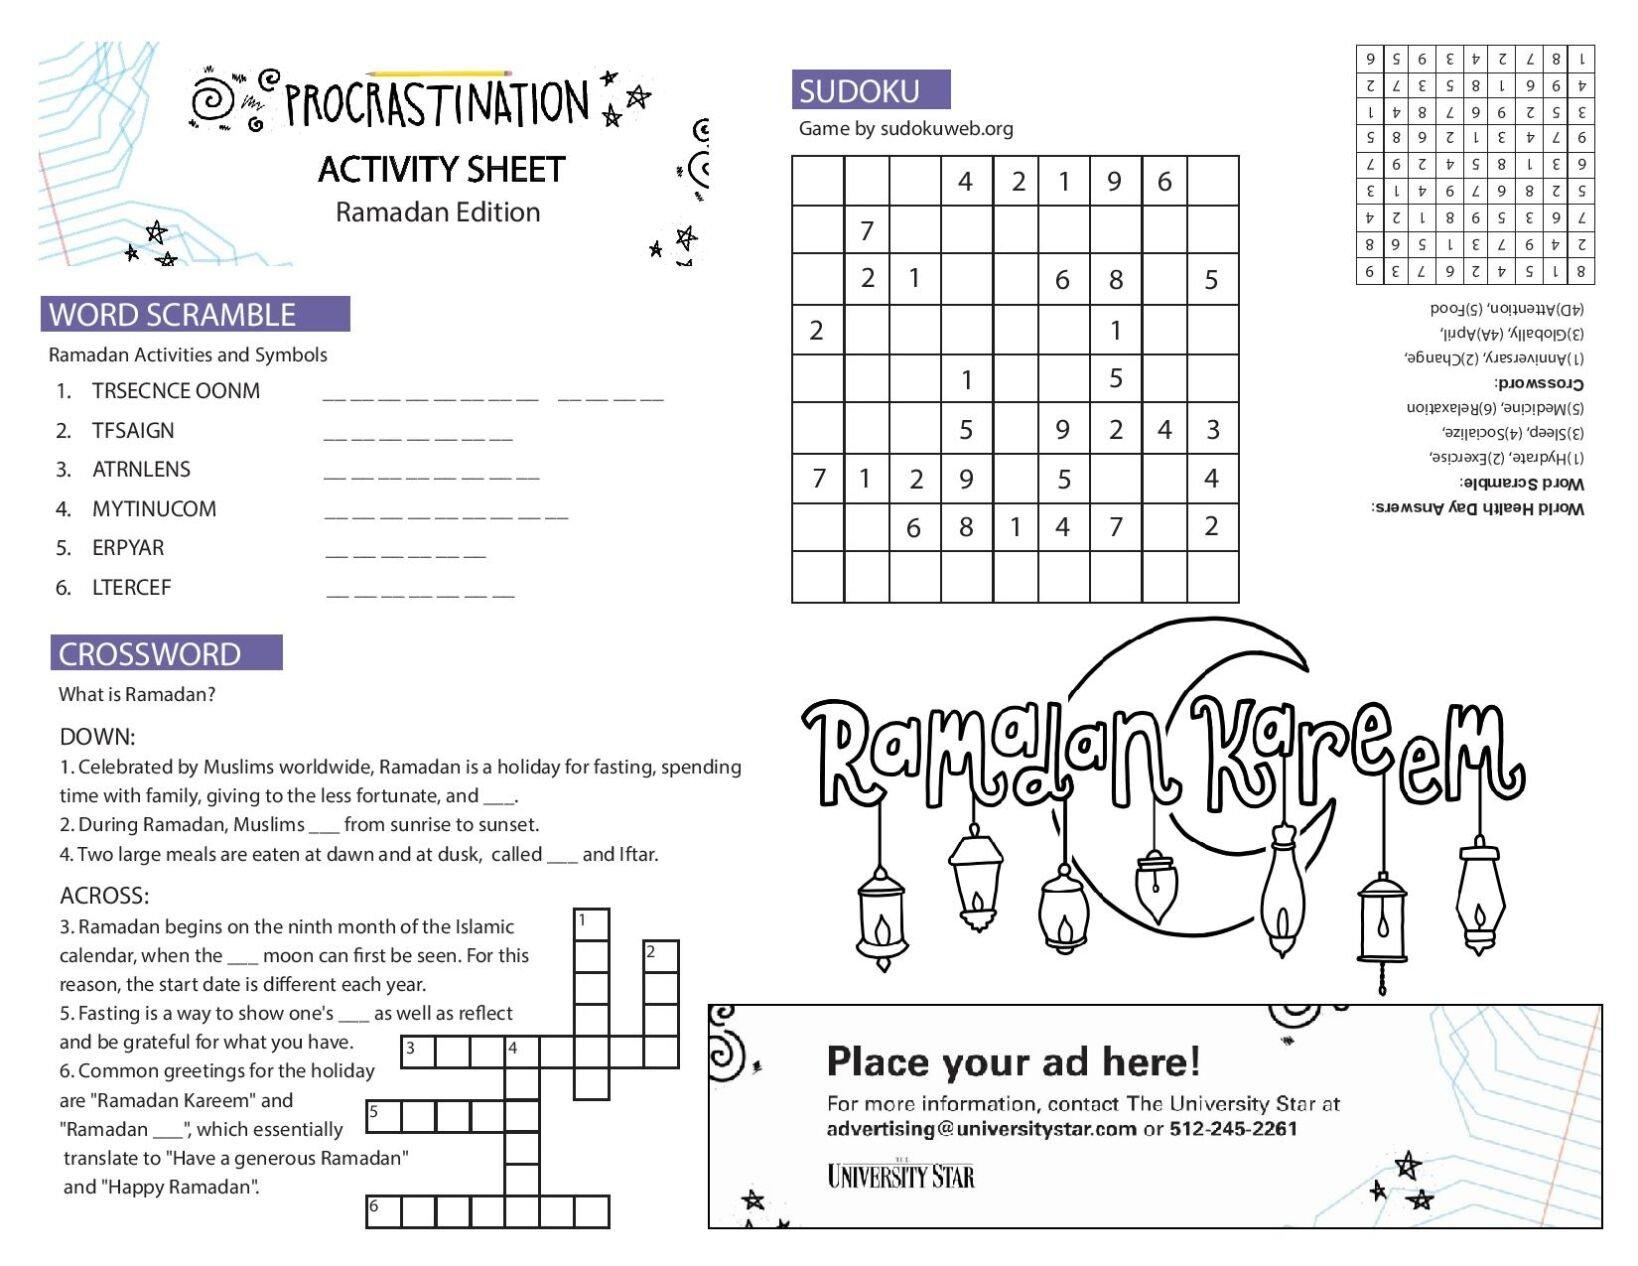 04/13 printable activity sheet.